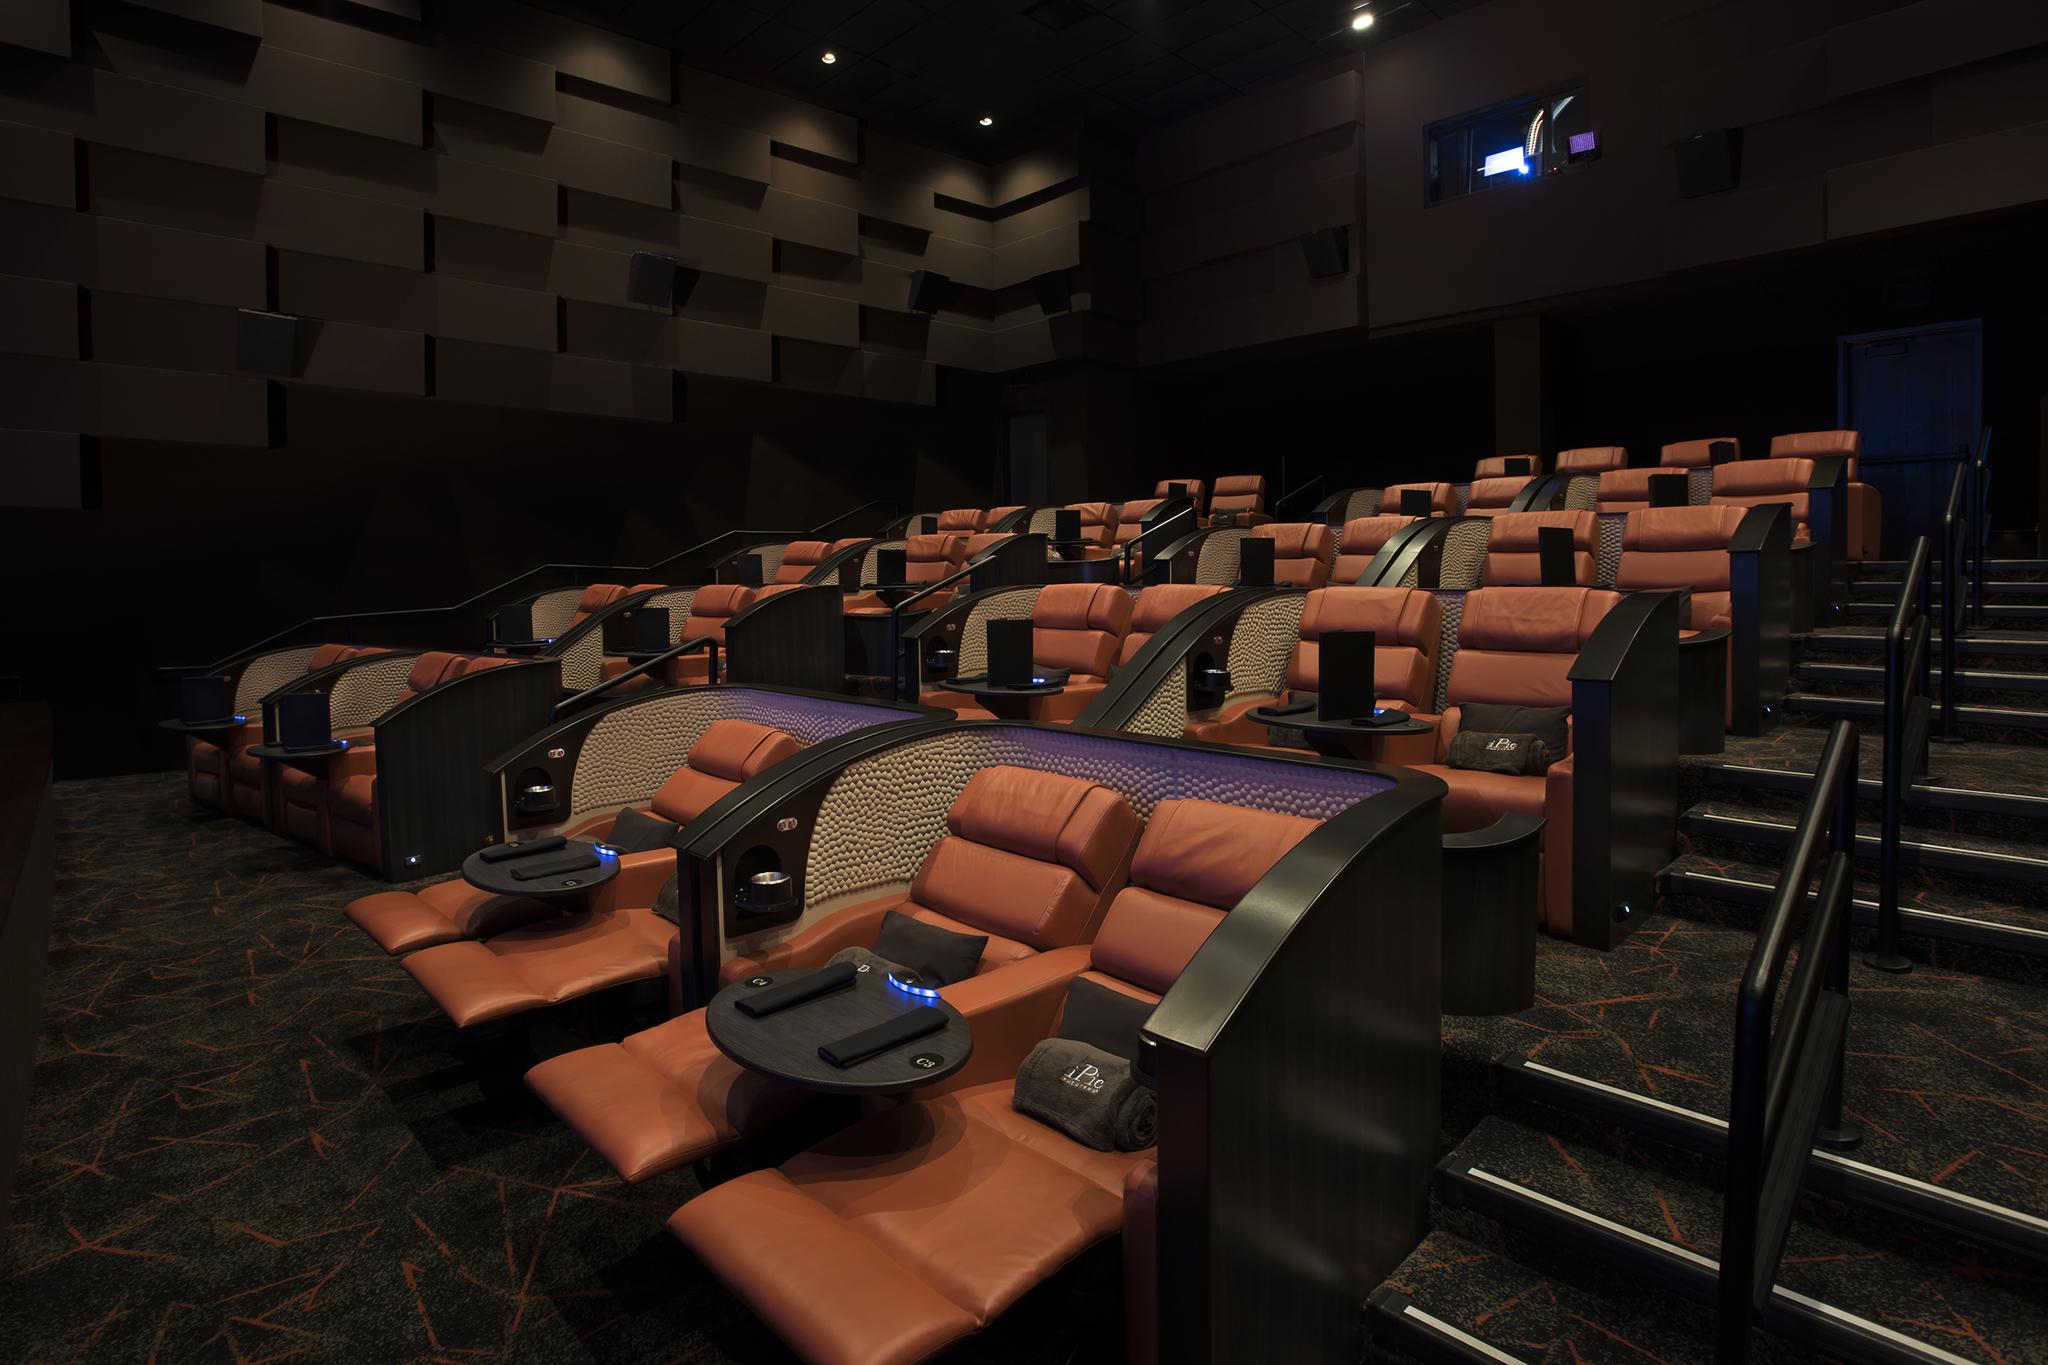 iPic Theaters at Fulton Market